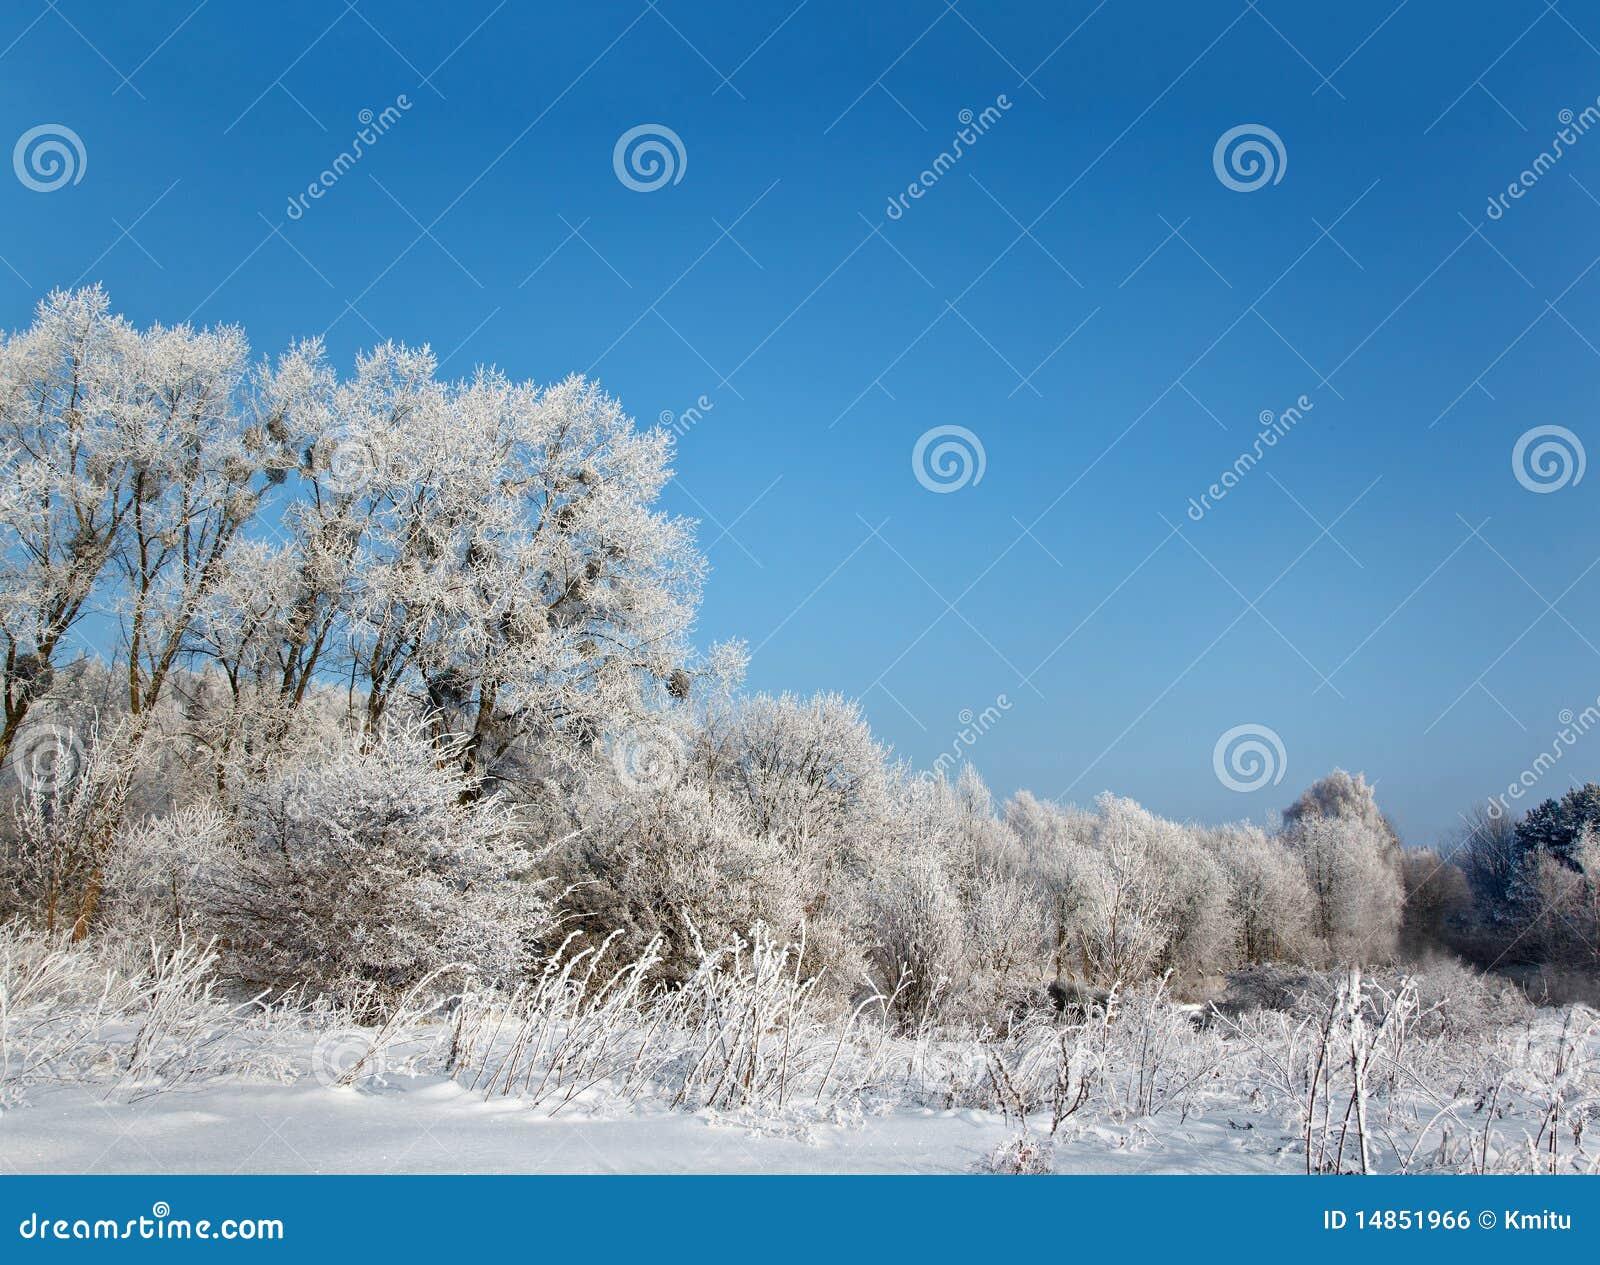 Wild winter scenery